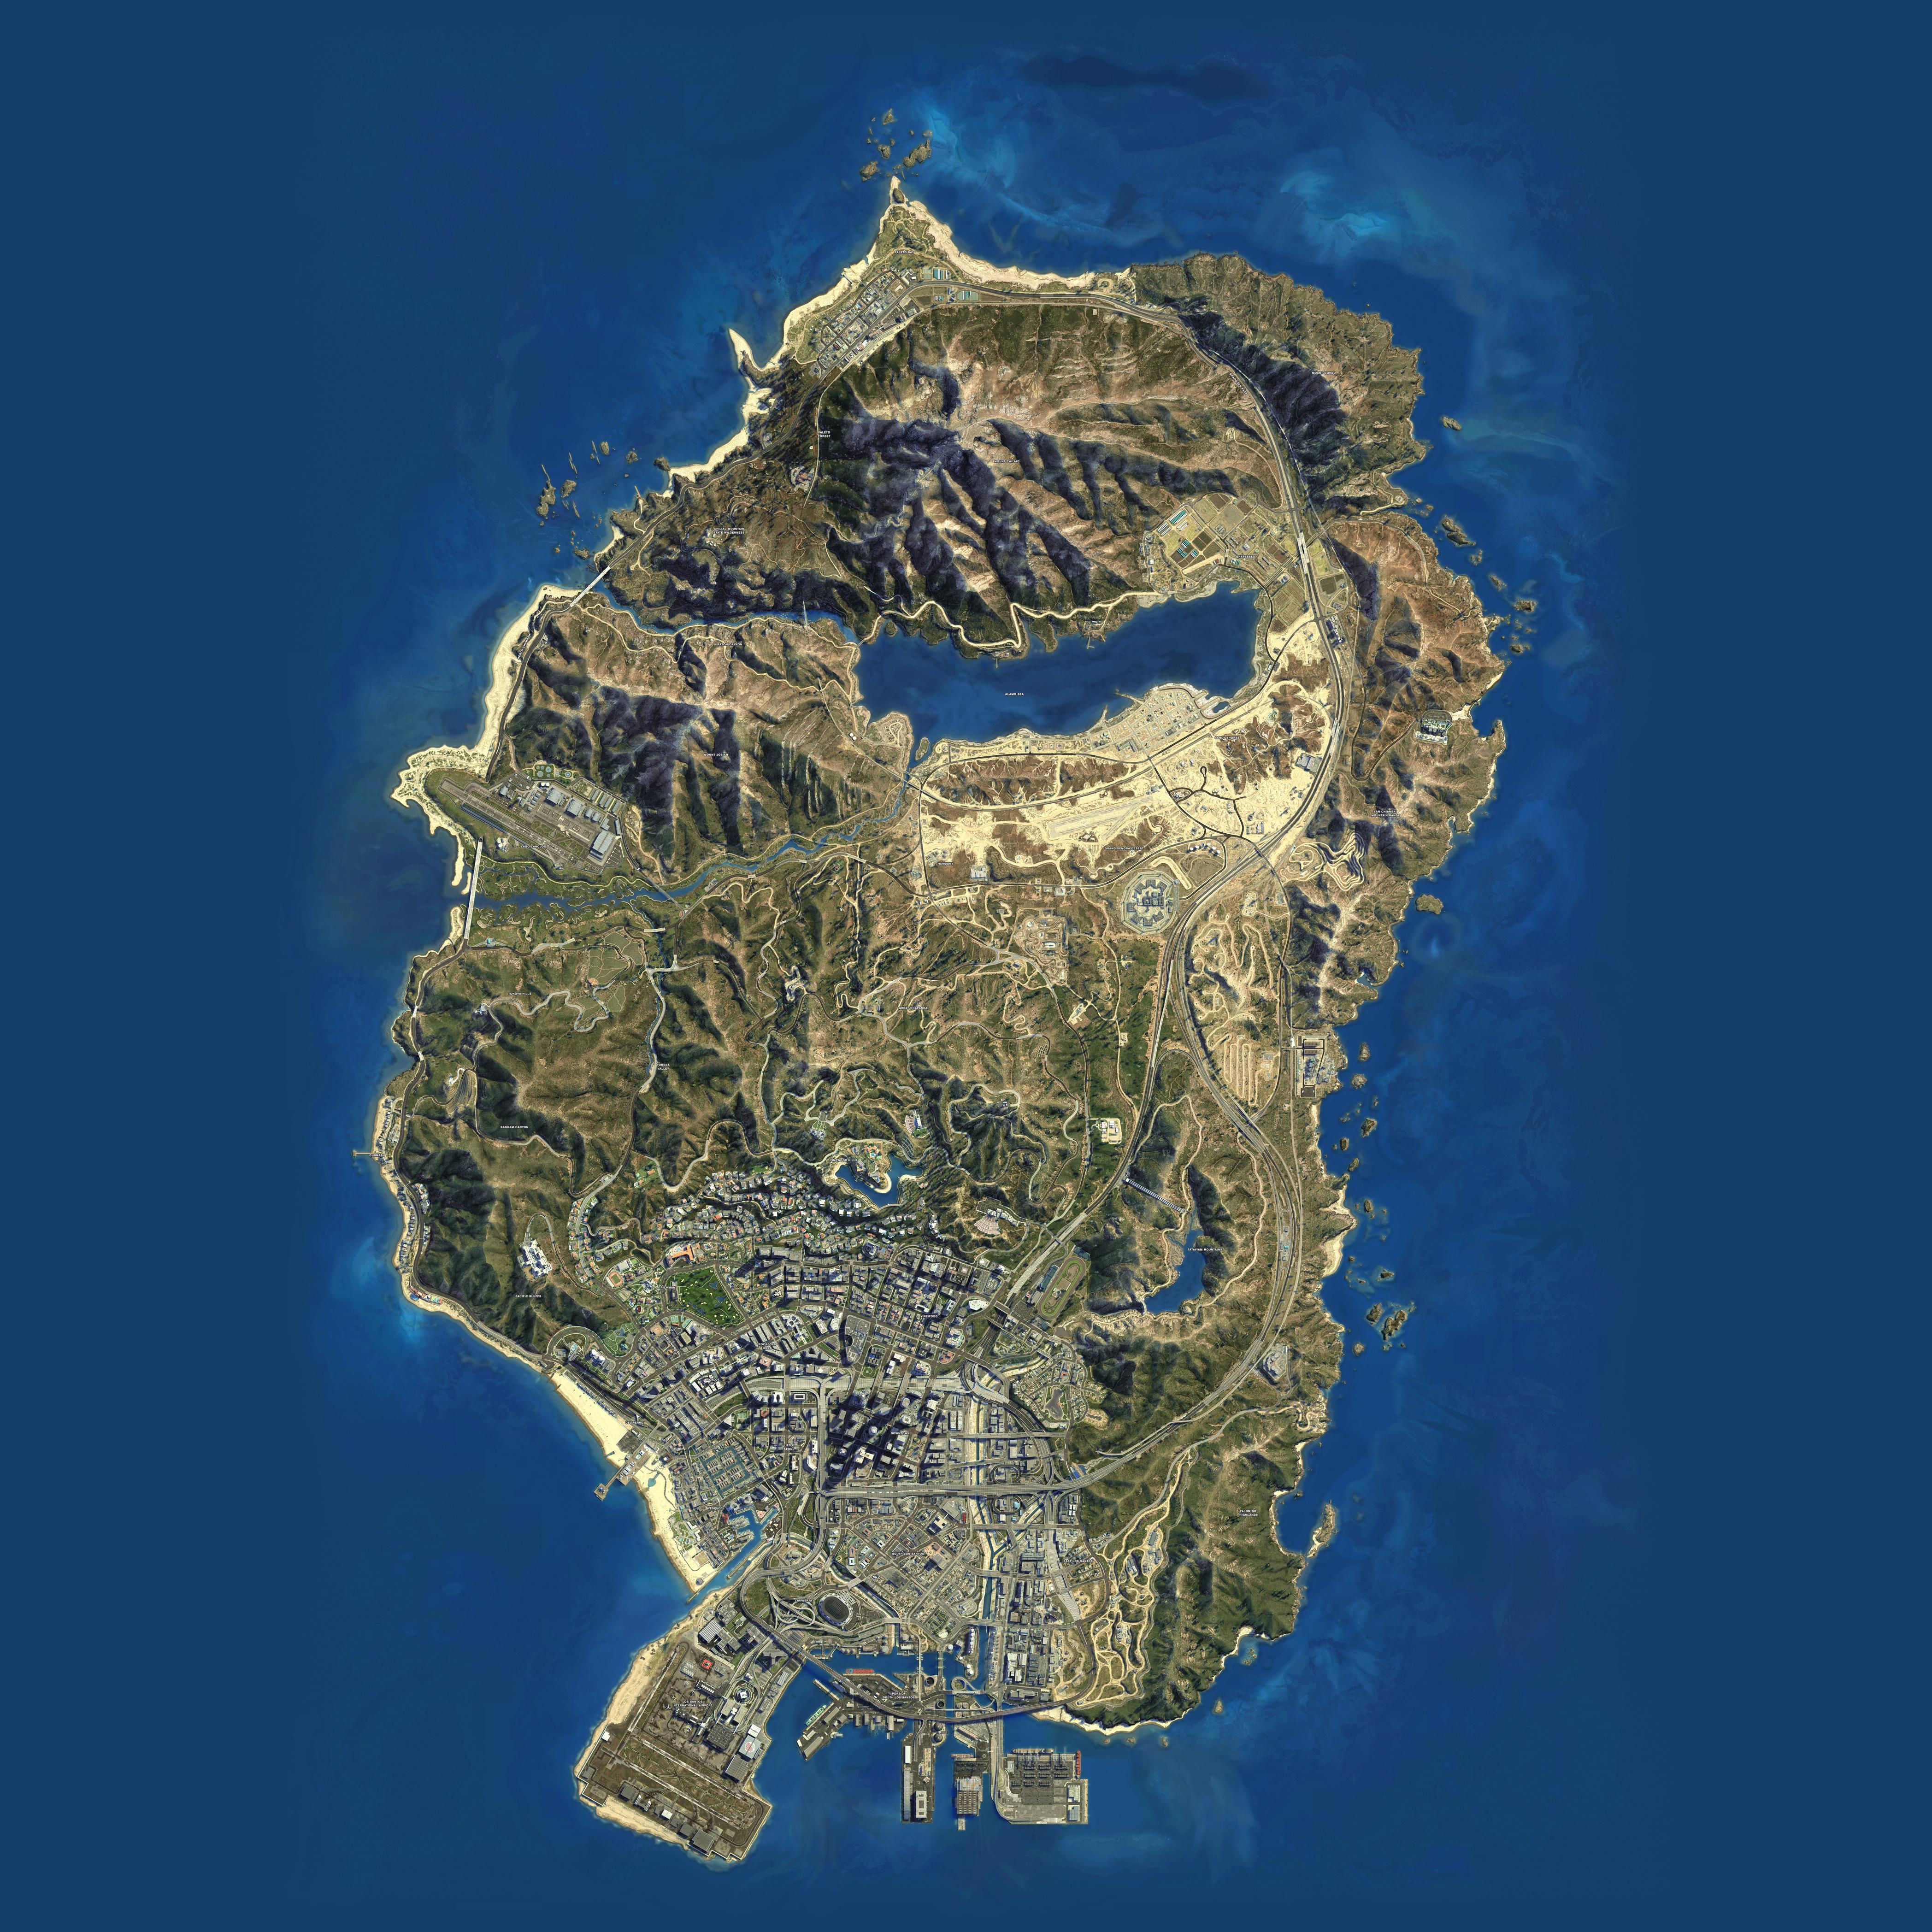 Image cj gtav transparent png gta wiki the grand theft auto wiki - Grand Theft Auto Encyclopedia Gta Wiki Gta Iii Vice City